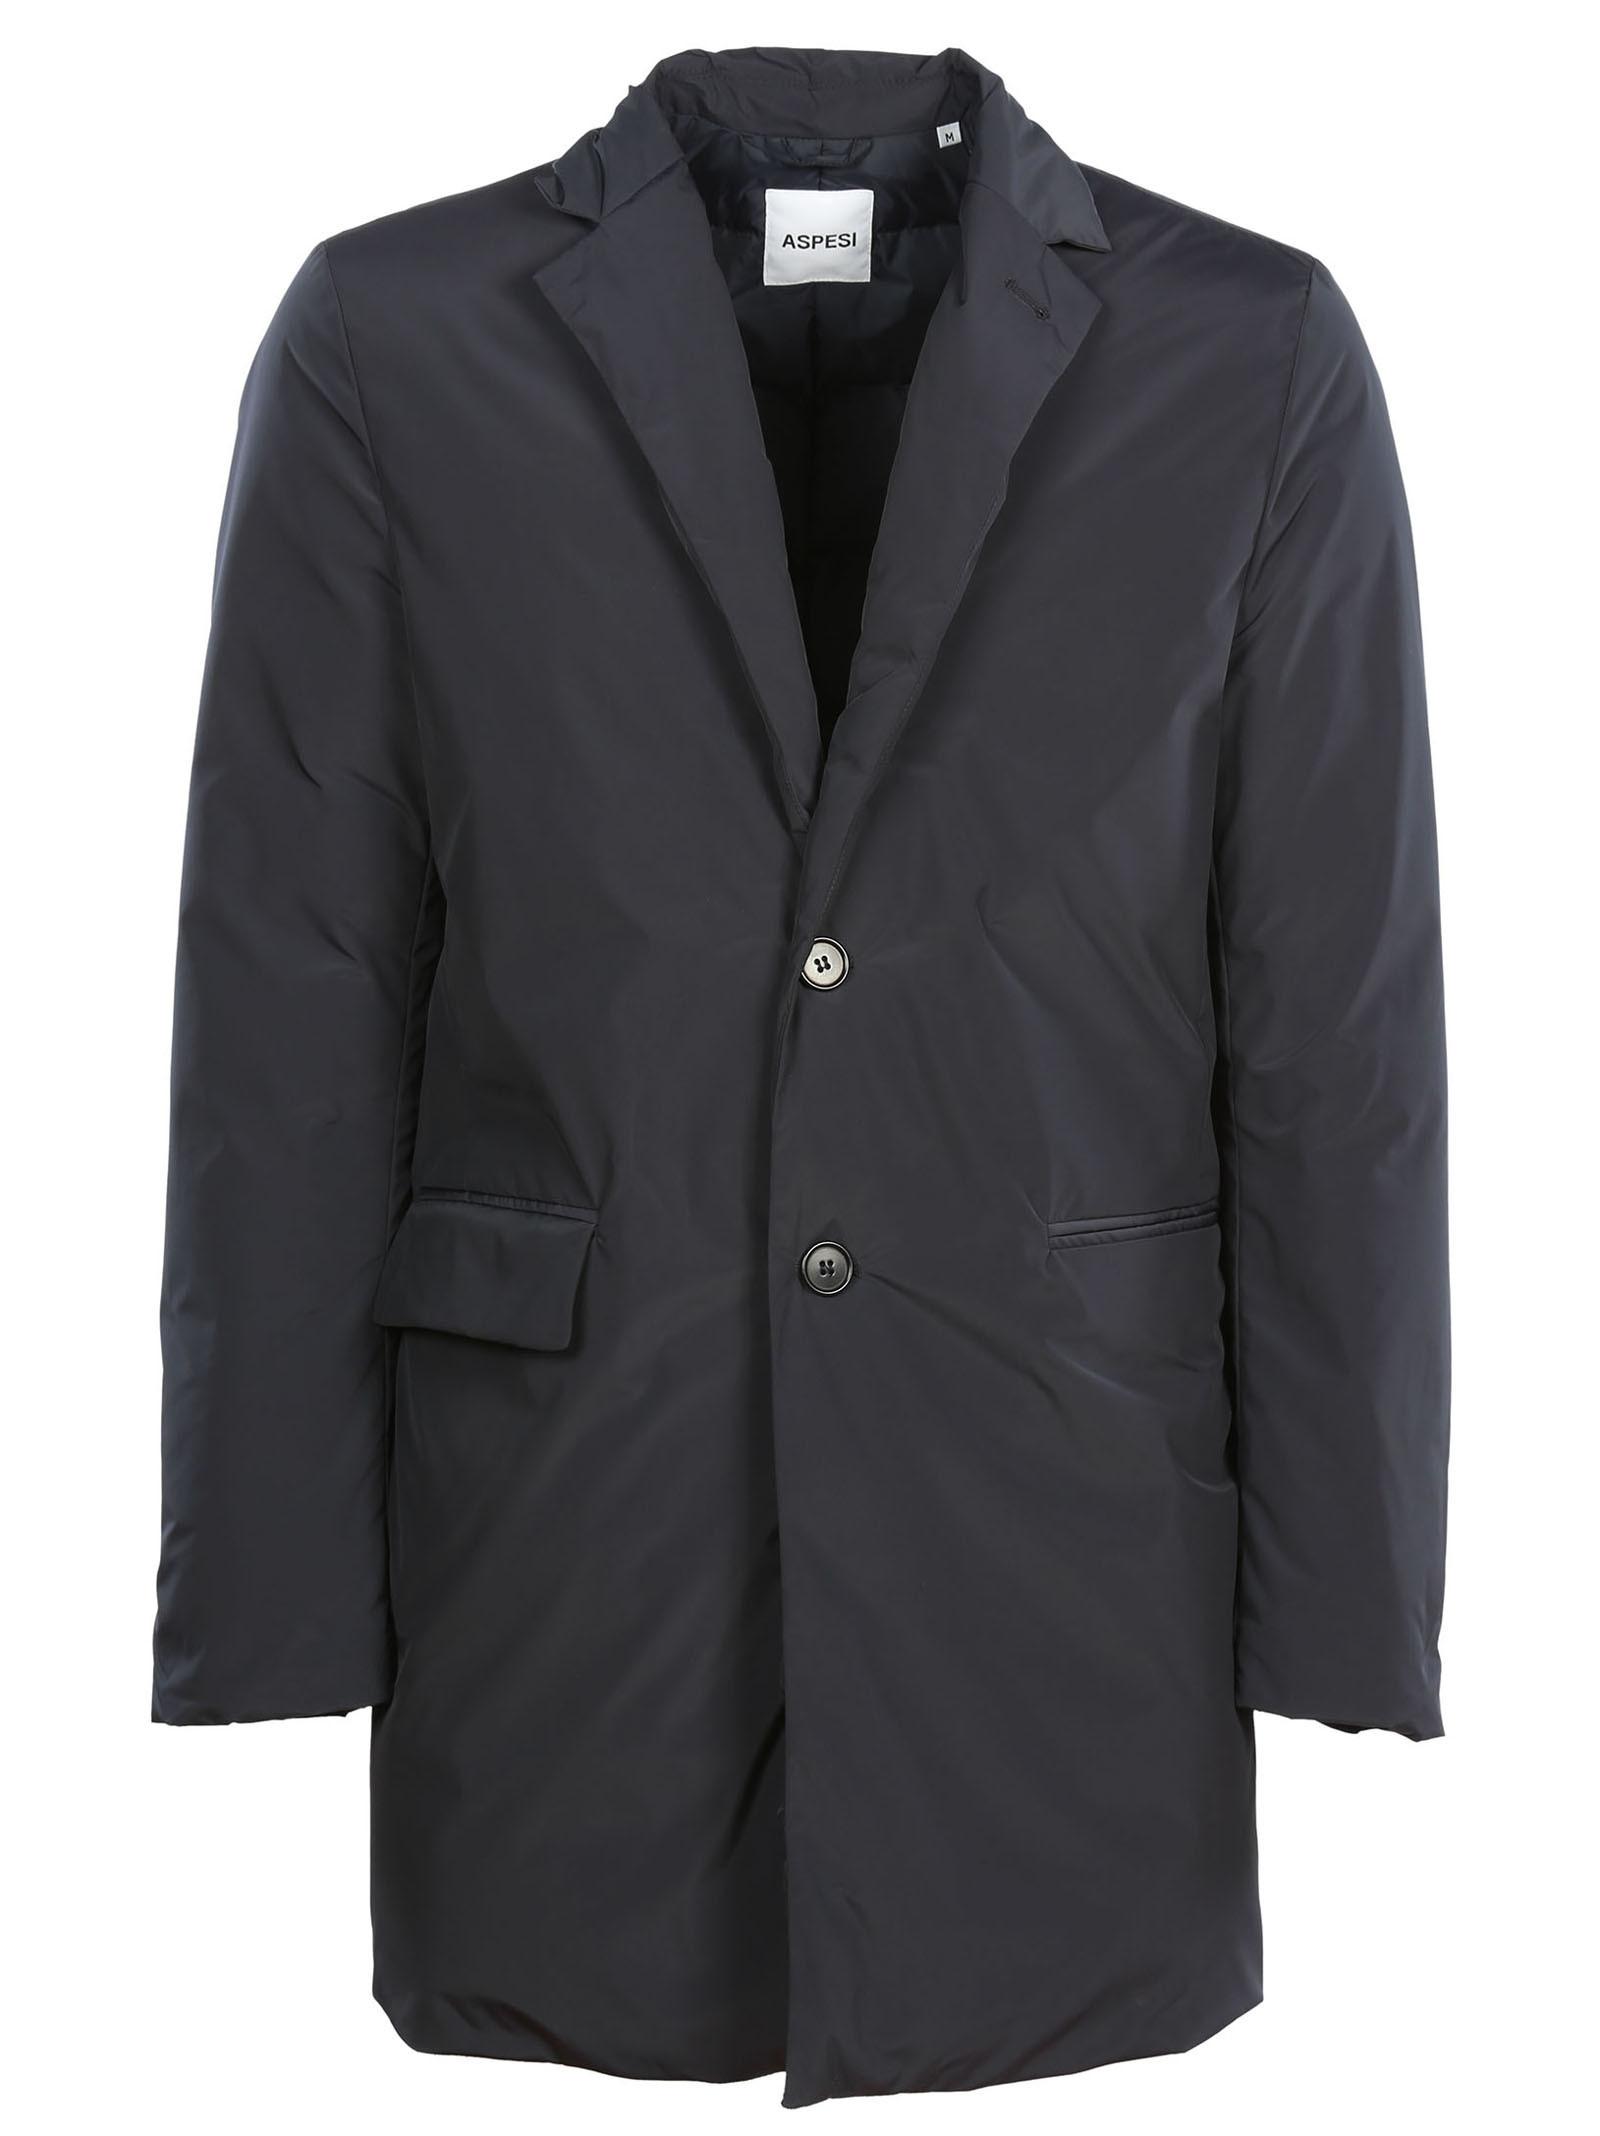 Aspesi Millennium Coat